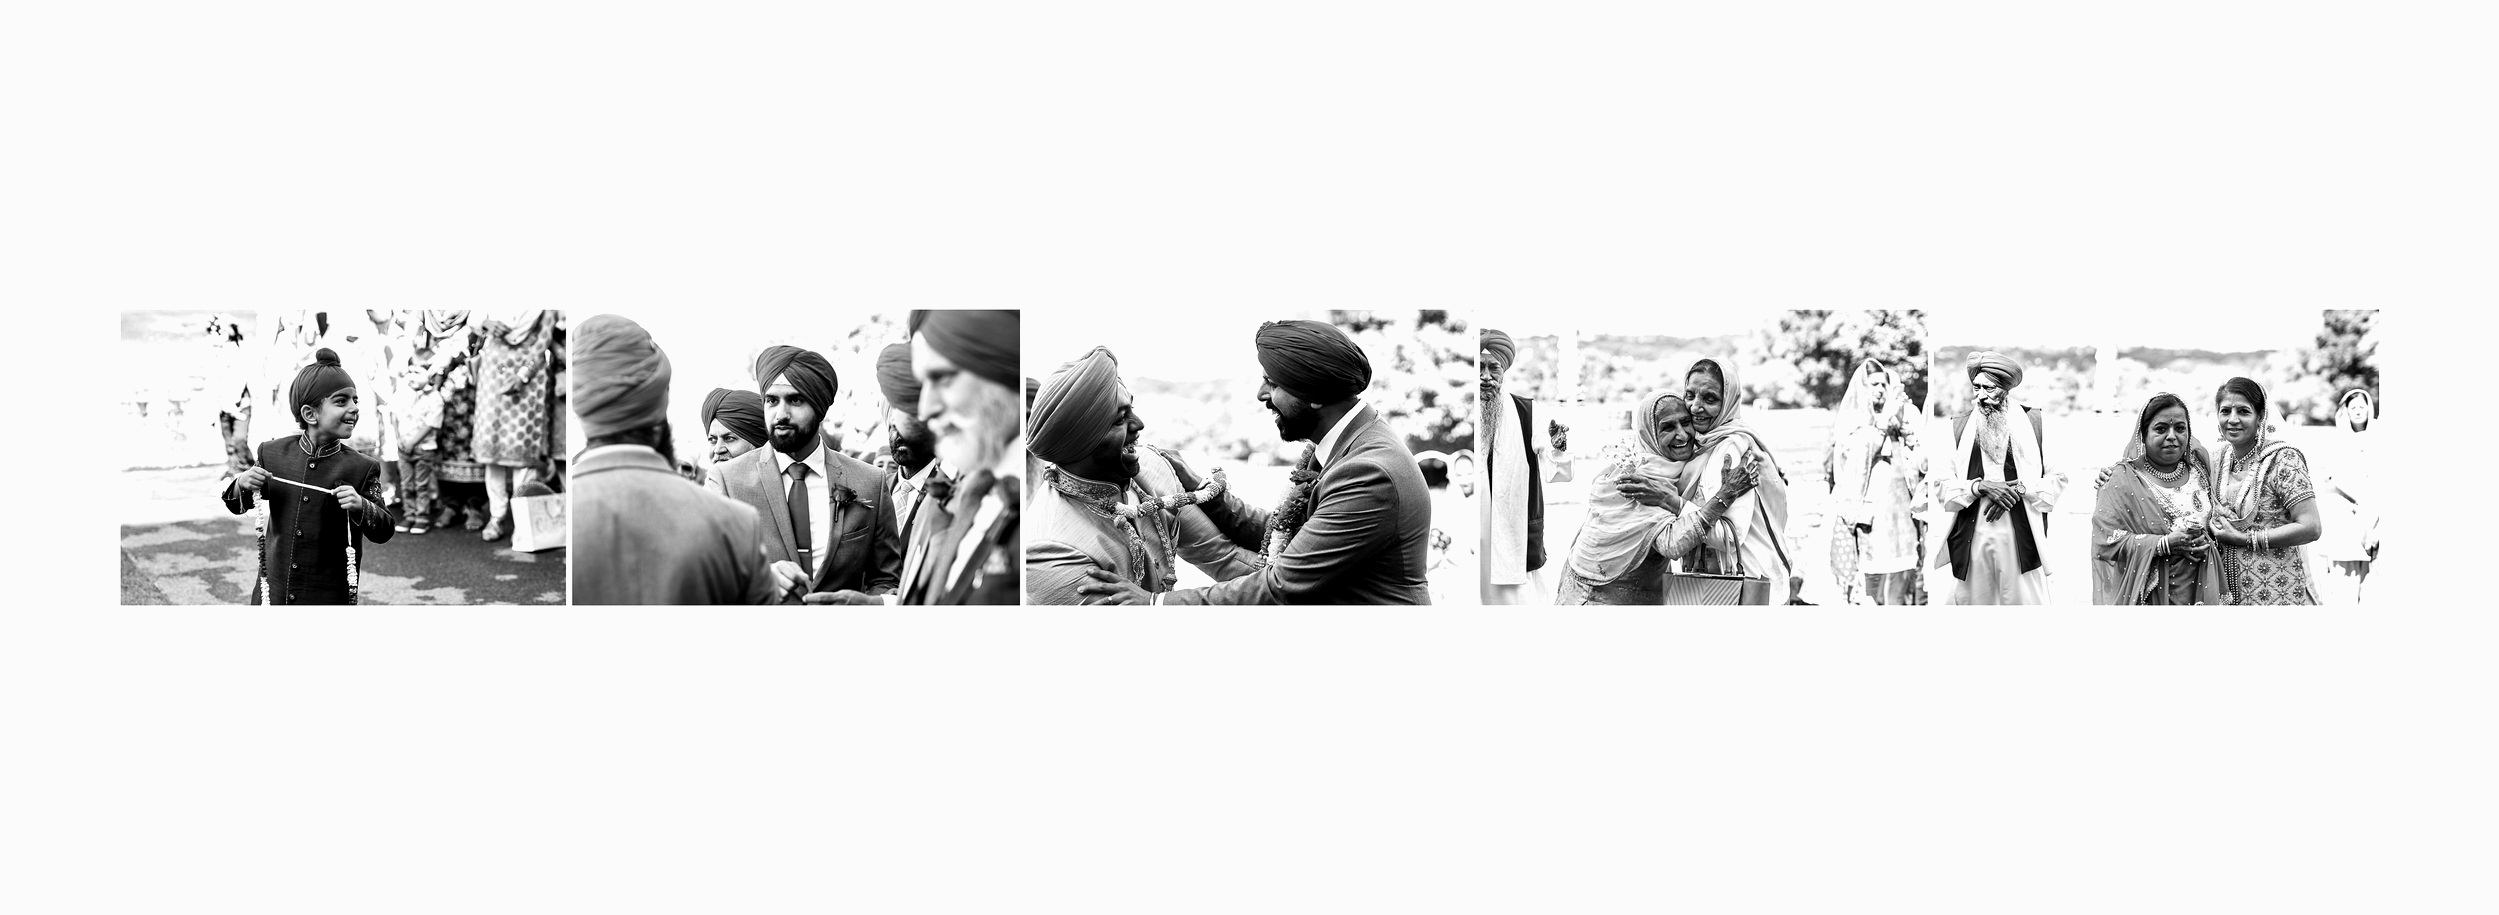 Sikh Wedding - Jaspreet and Indy-23.jpg